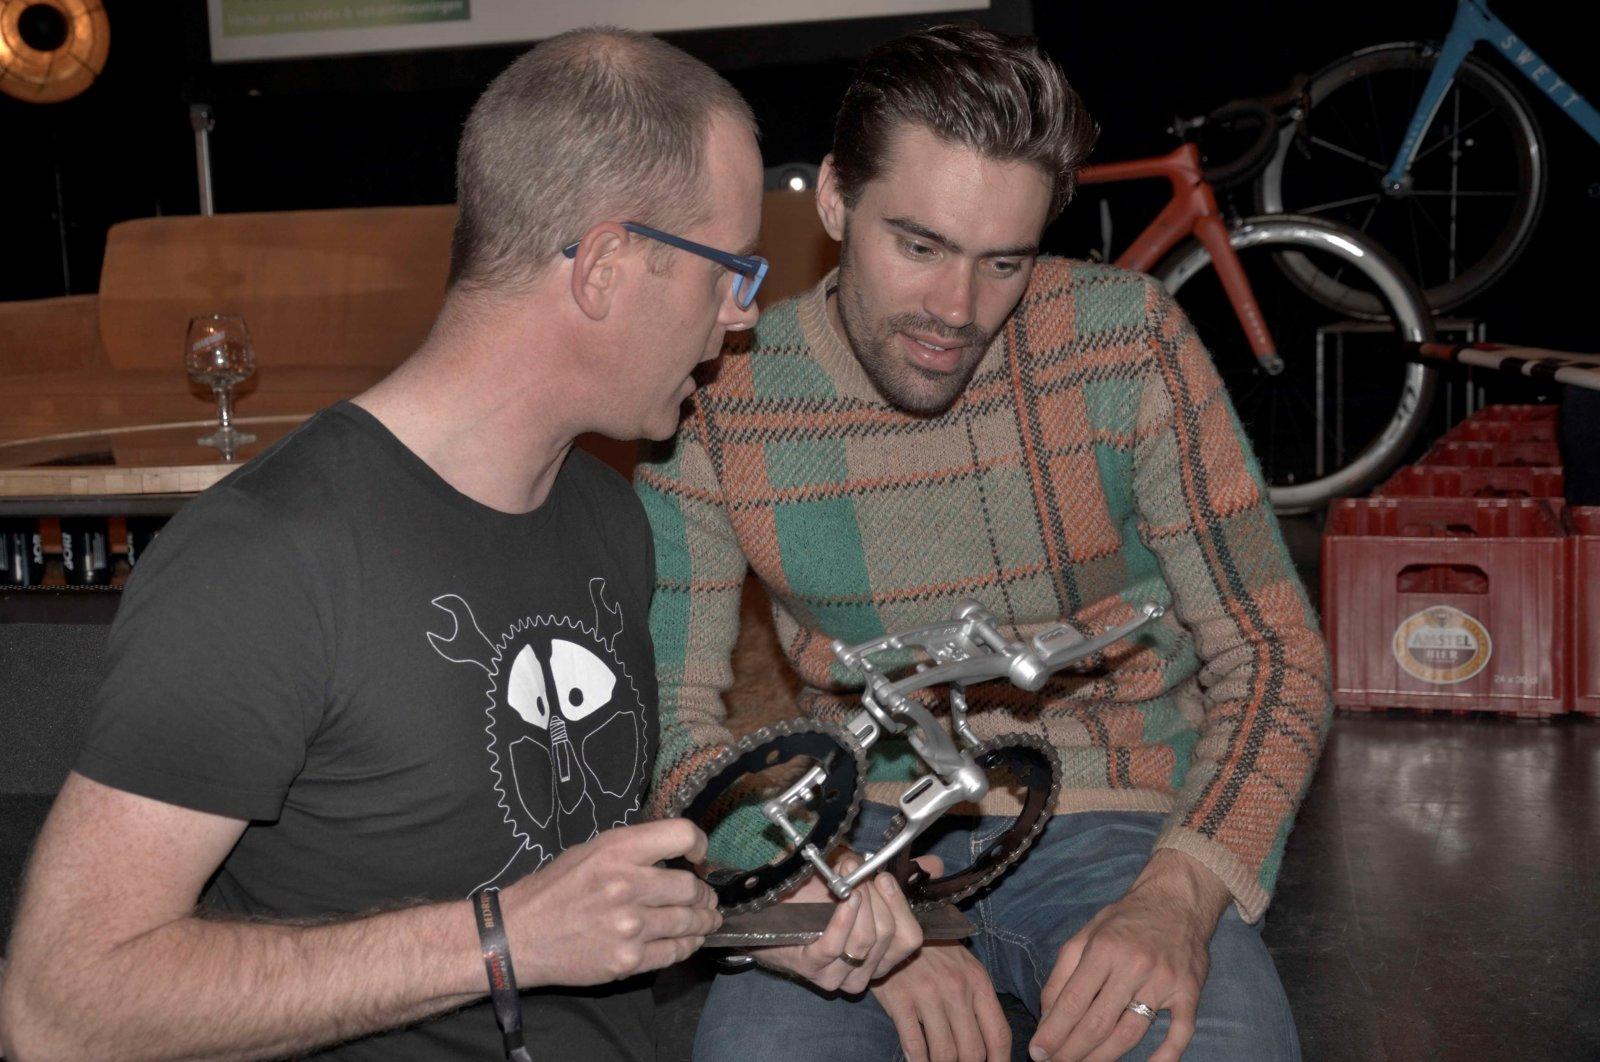 Tom Dumoulin Fietskunst Oropa Bicycle Art Cyclist